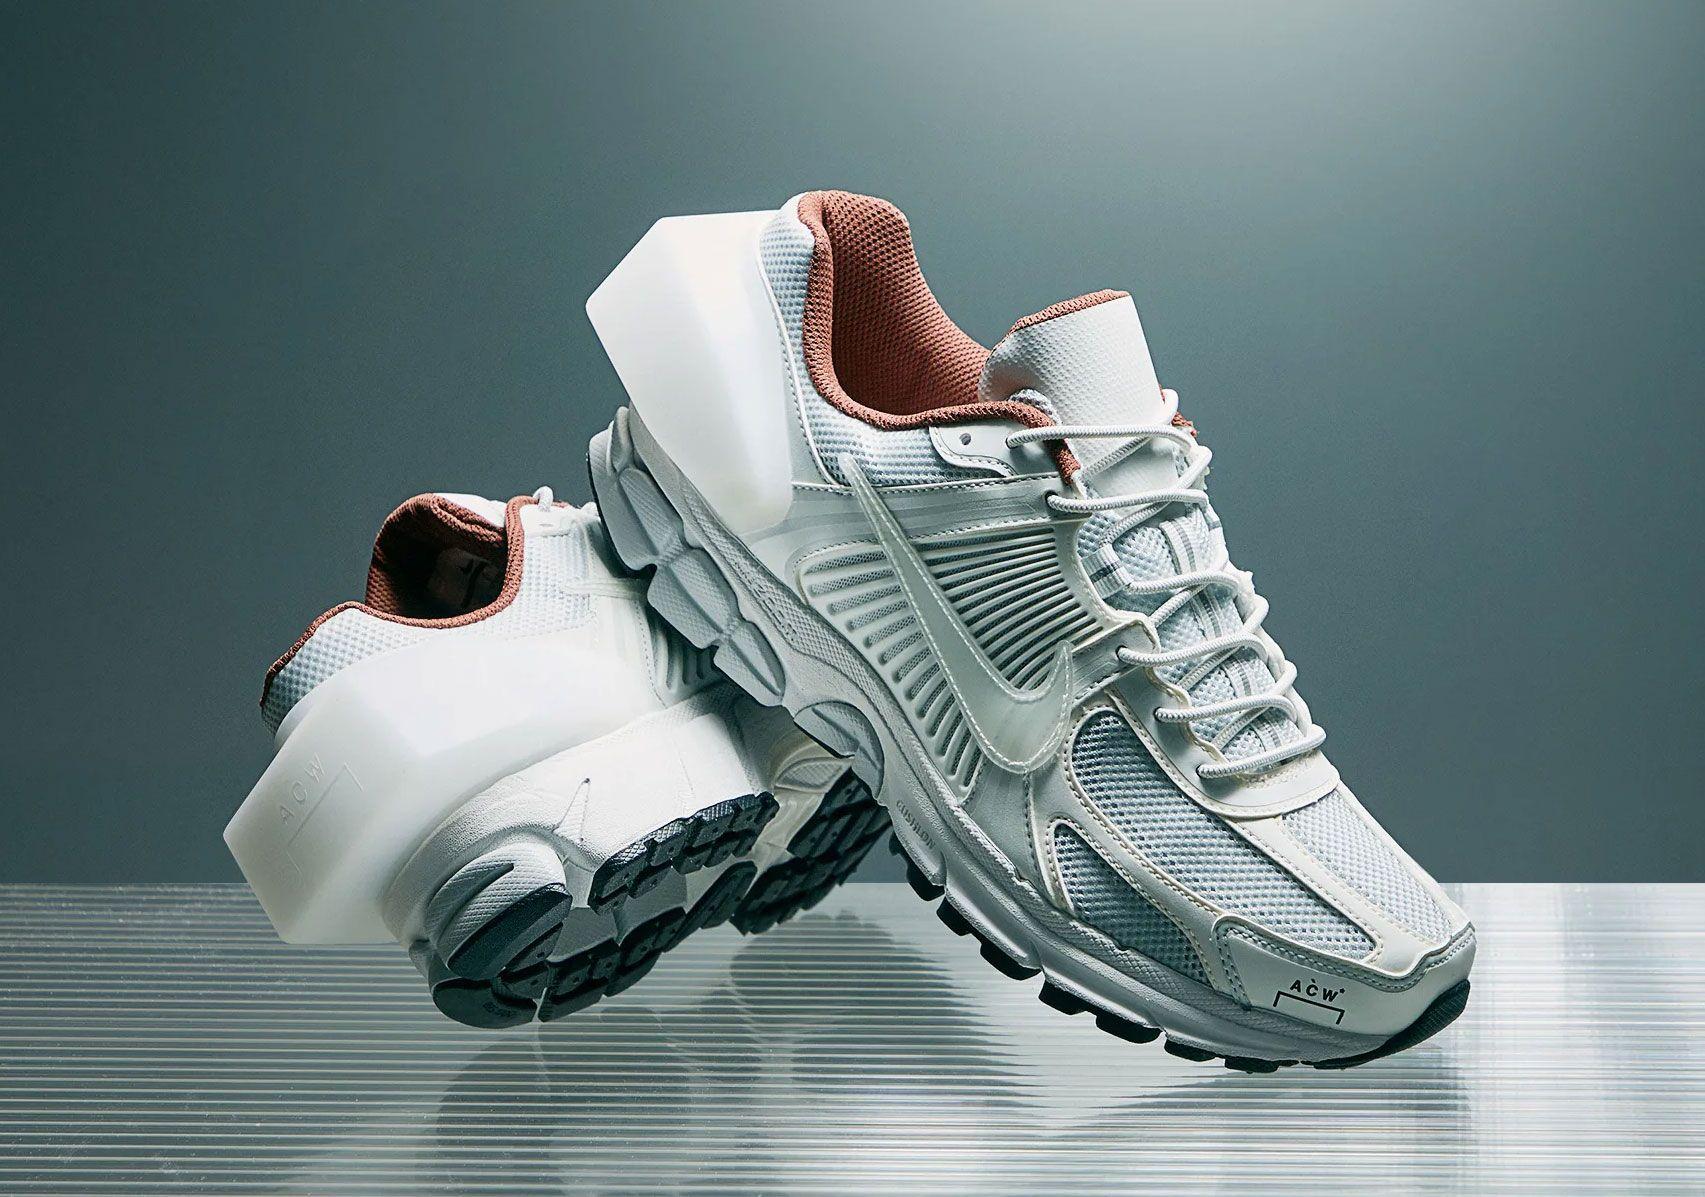 purchase cheap da5fd 61723 A-COLD-WALL x Nike Zoom Vomero 5 nike sneakers